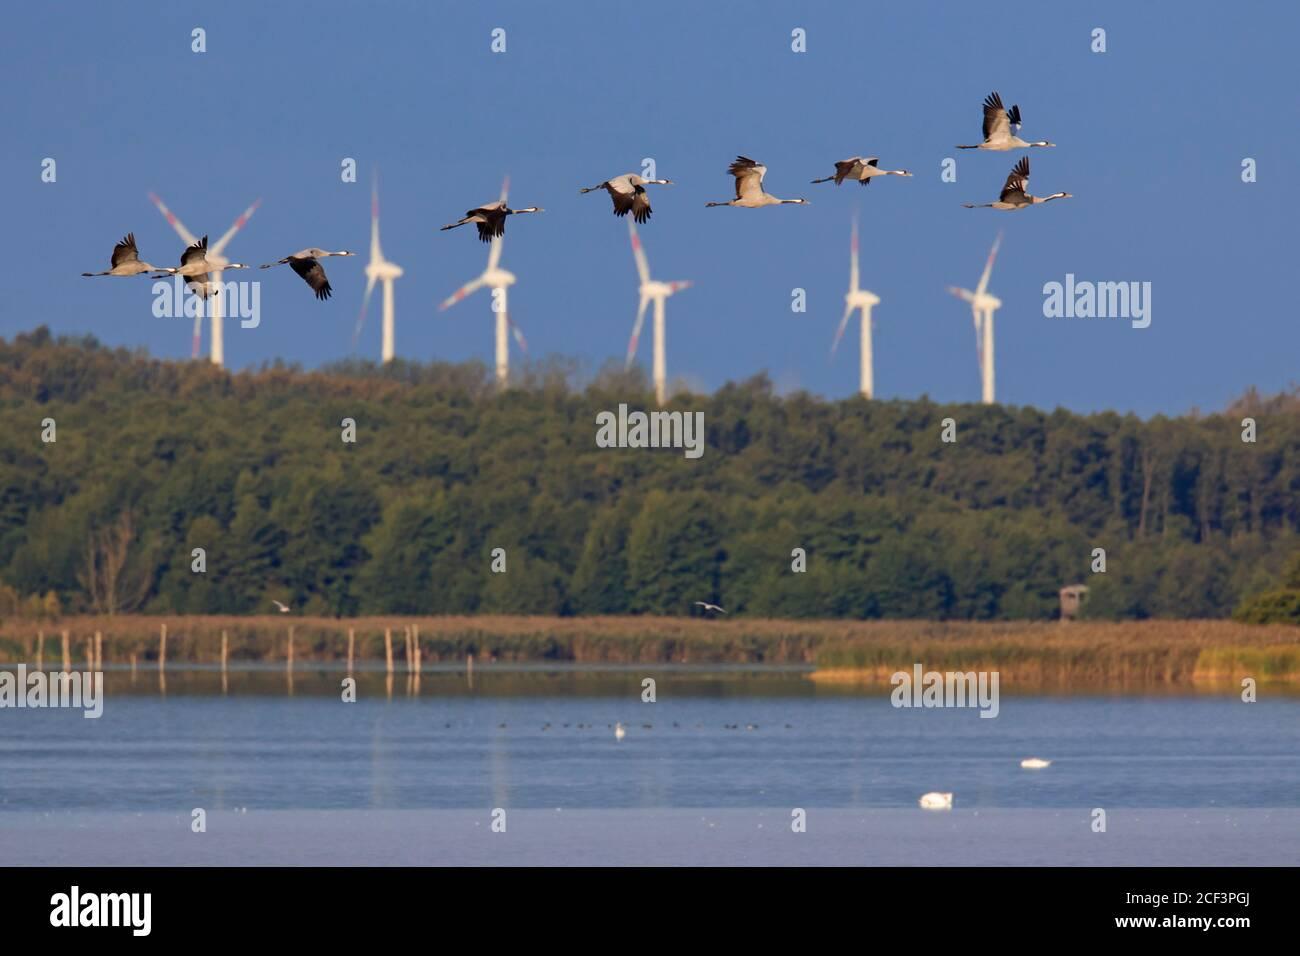 Flock of common cranes / Eurasian crane (Grus grus) group flying over lake in autumn / fall, Mecklenburg-Western Pomerania, Germany Stock Photo